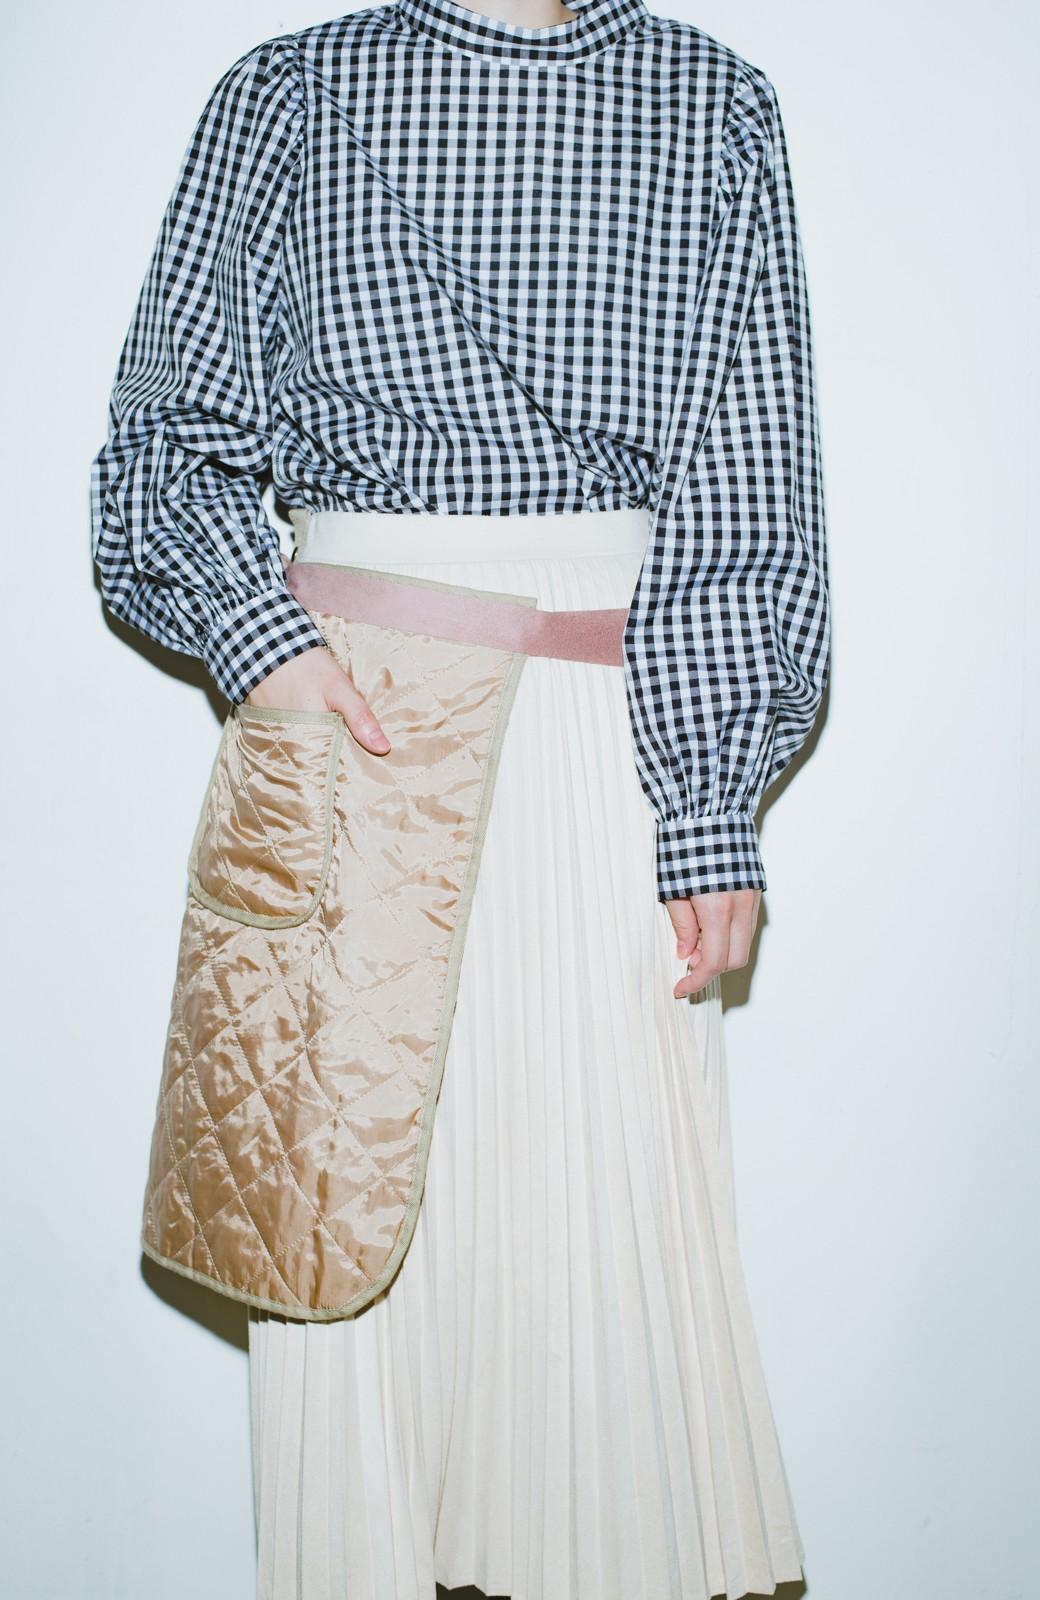 haco! haco! × RBTXCO  着回したっくさん!エプロン風巻きスカート <ライトベージュ>の商品写真2